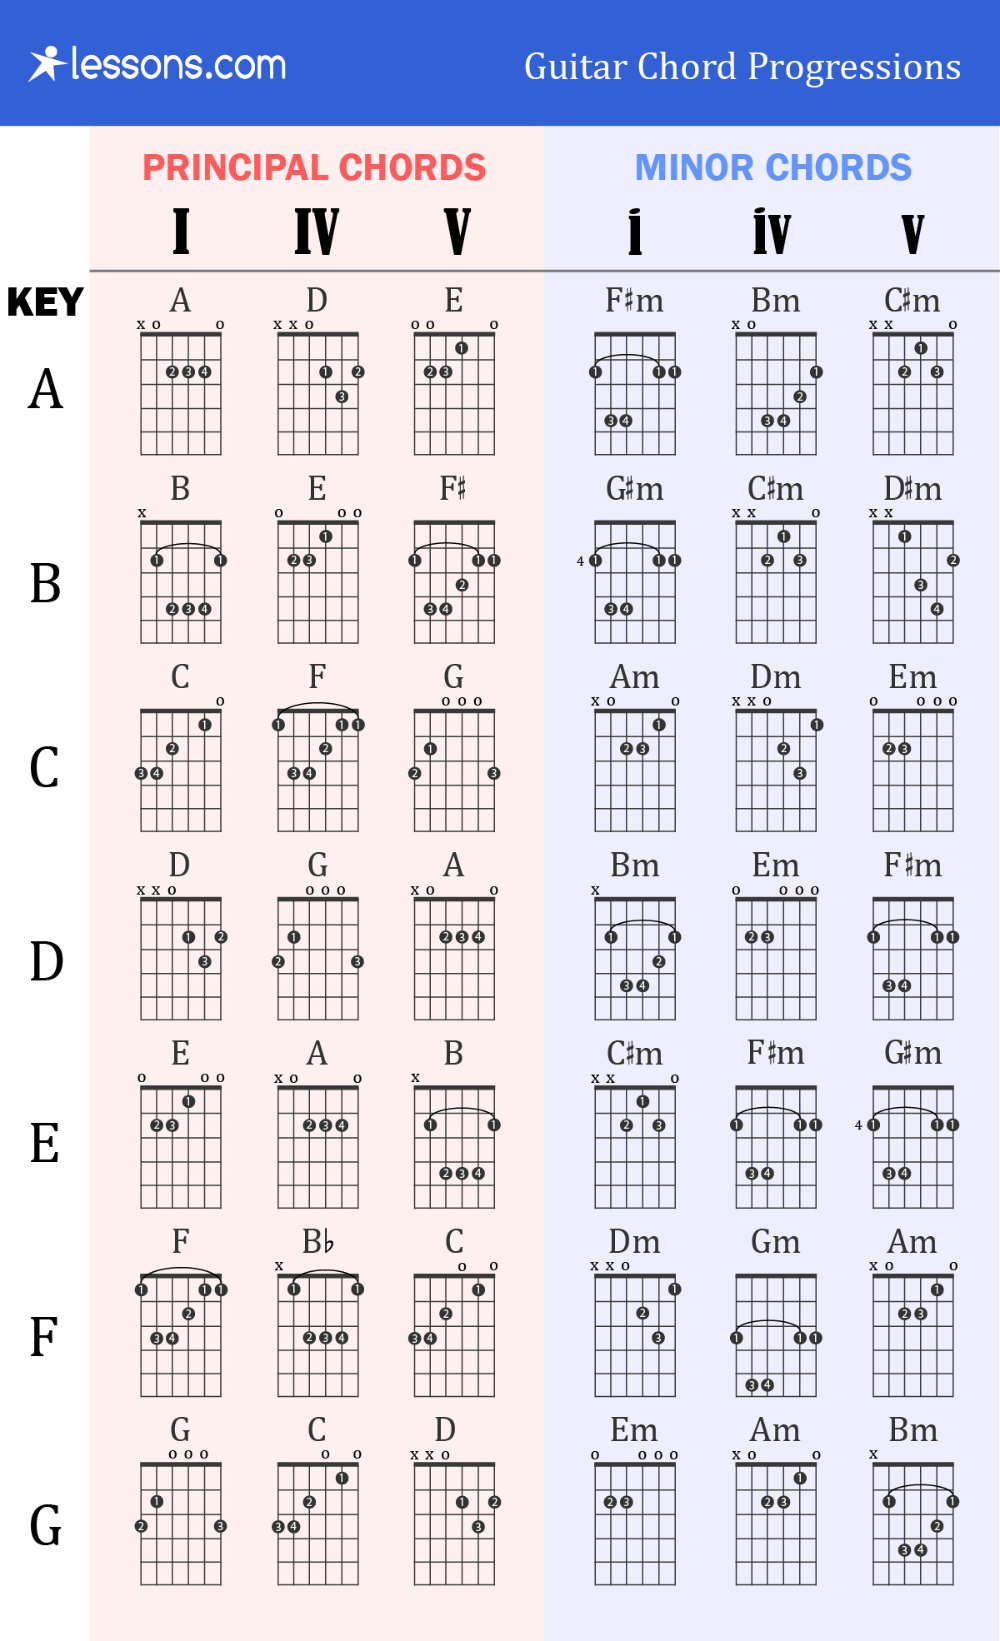 Guitar Chord Progressions in 2020 Guitar chords, Guitar